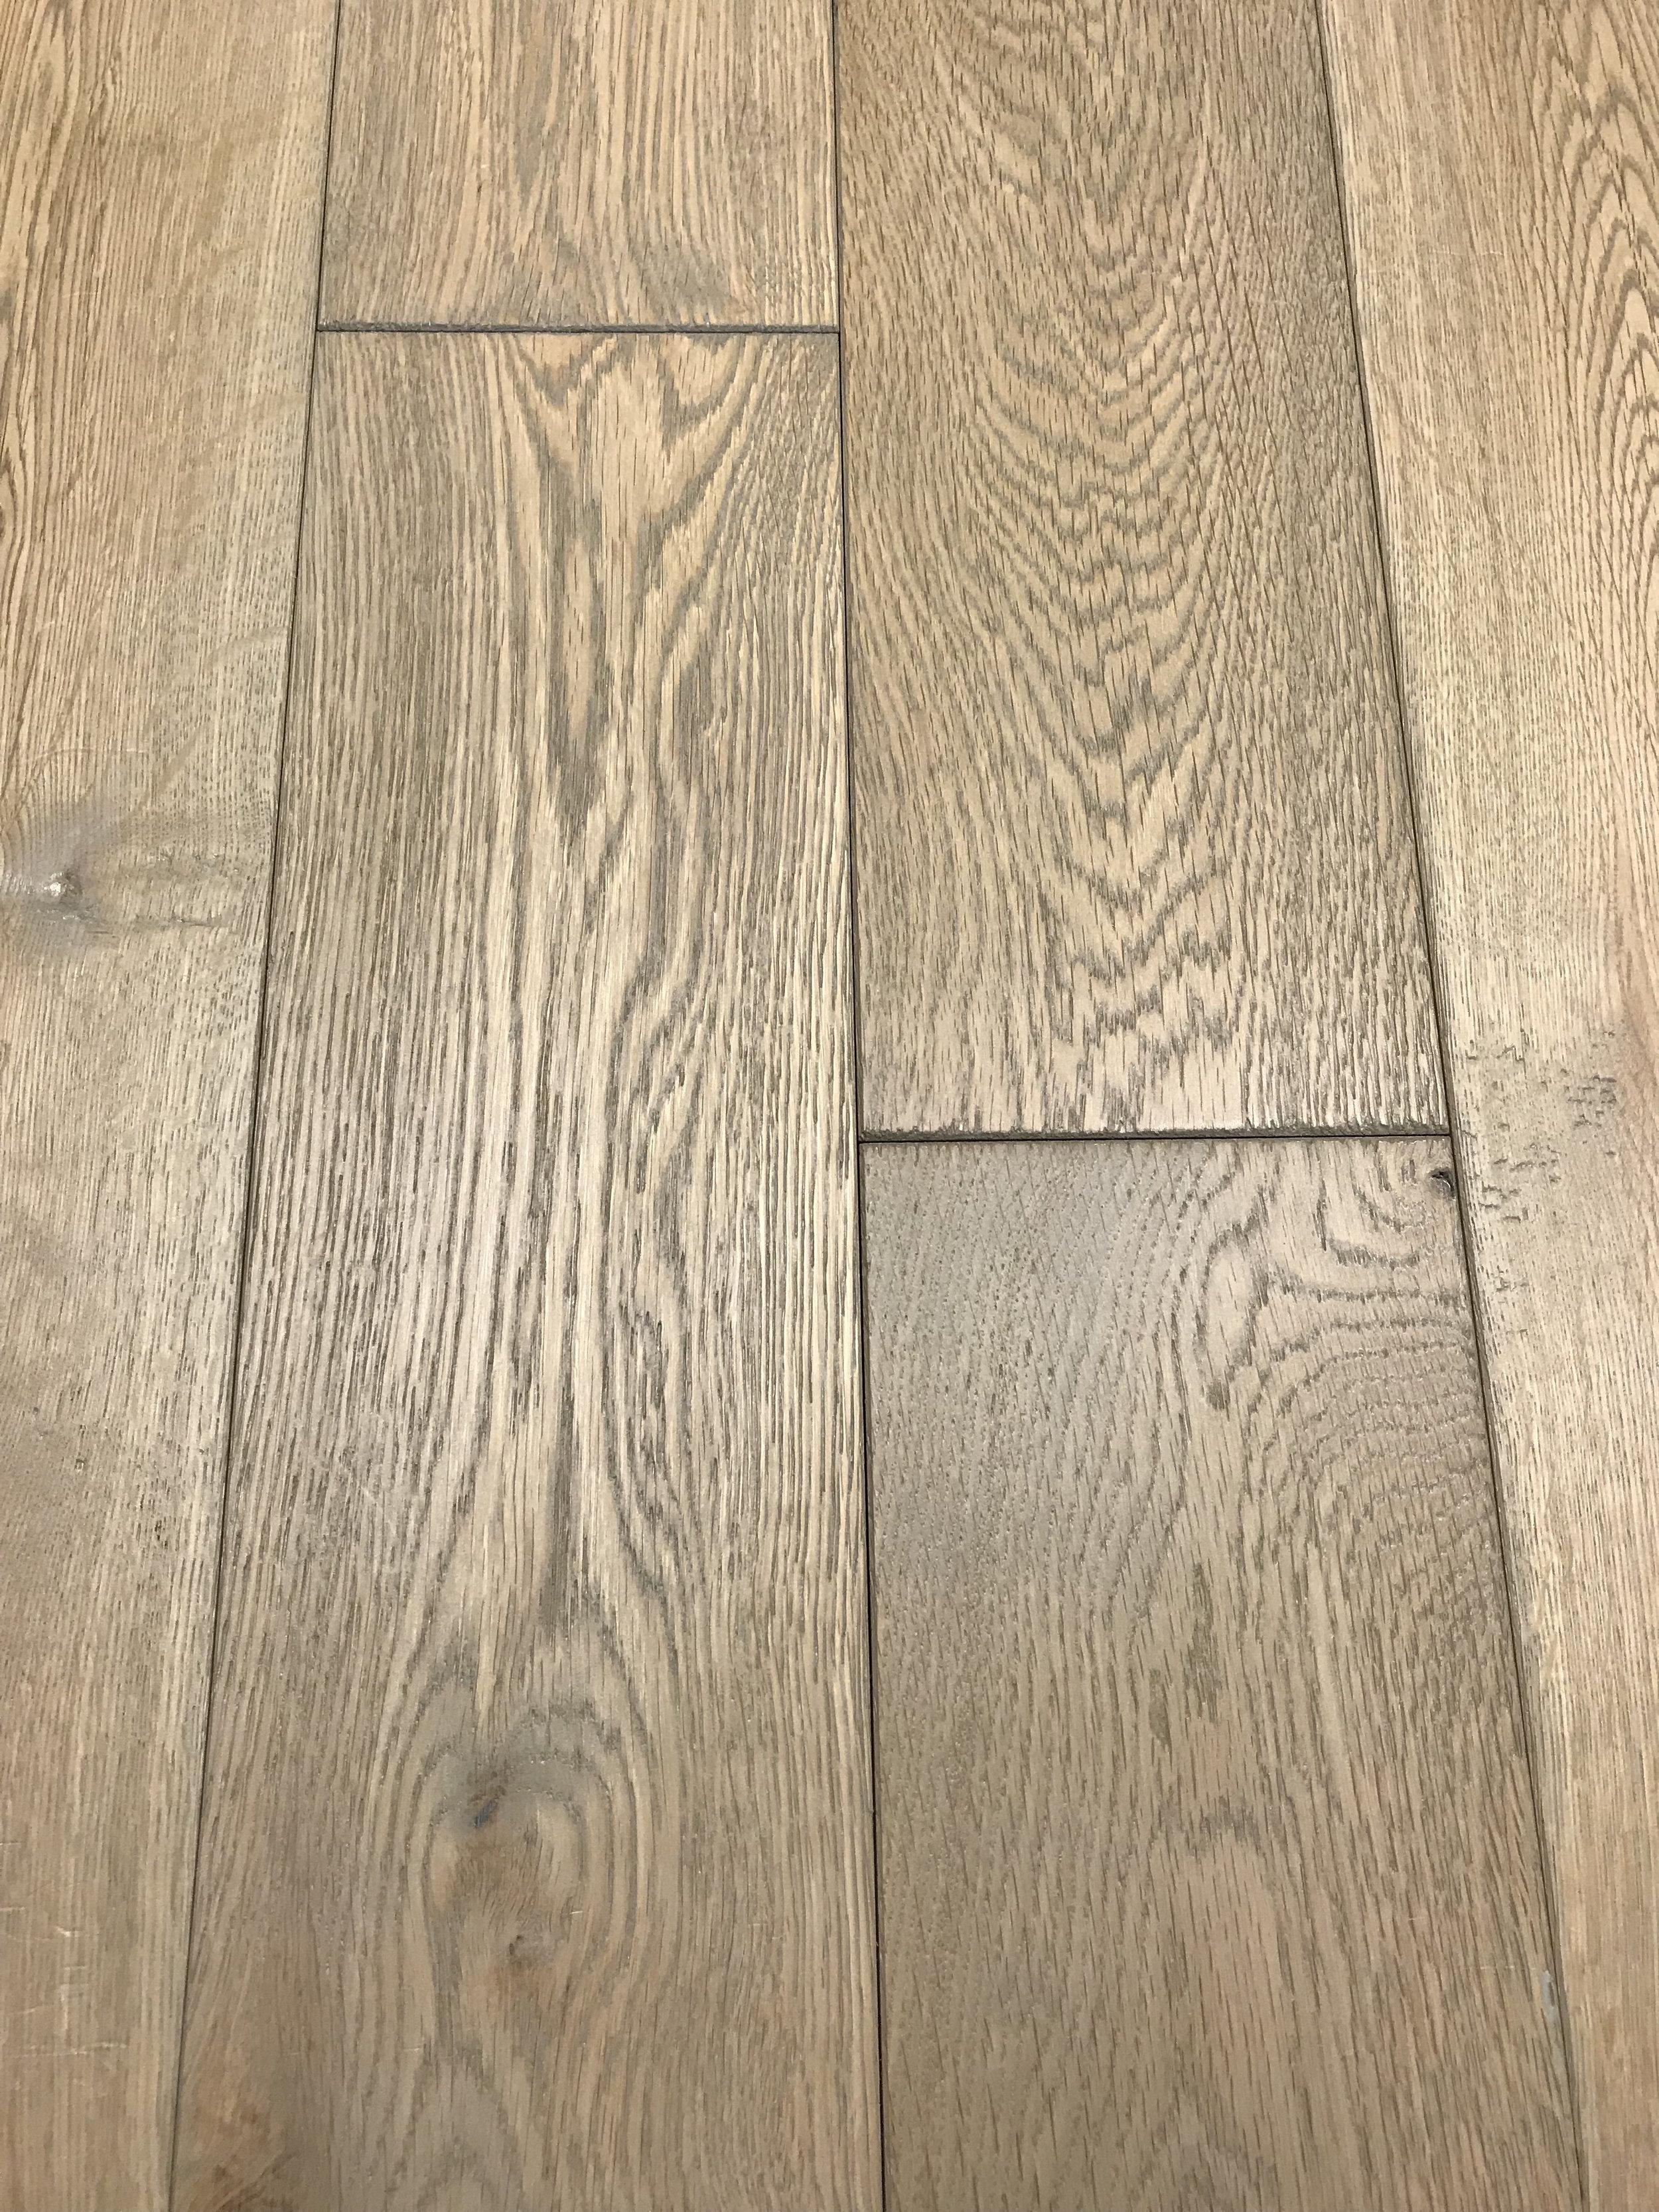 Ludlow Row Floors - option 2.jpg